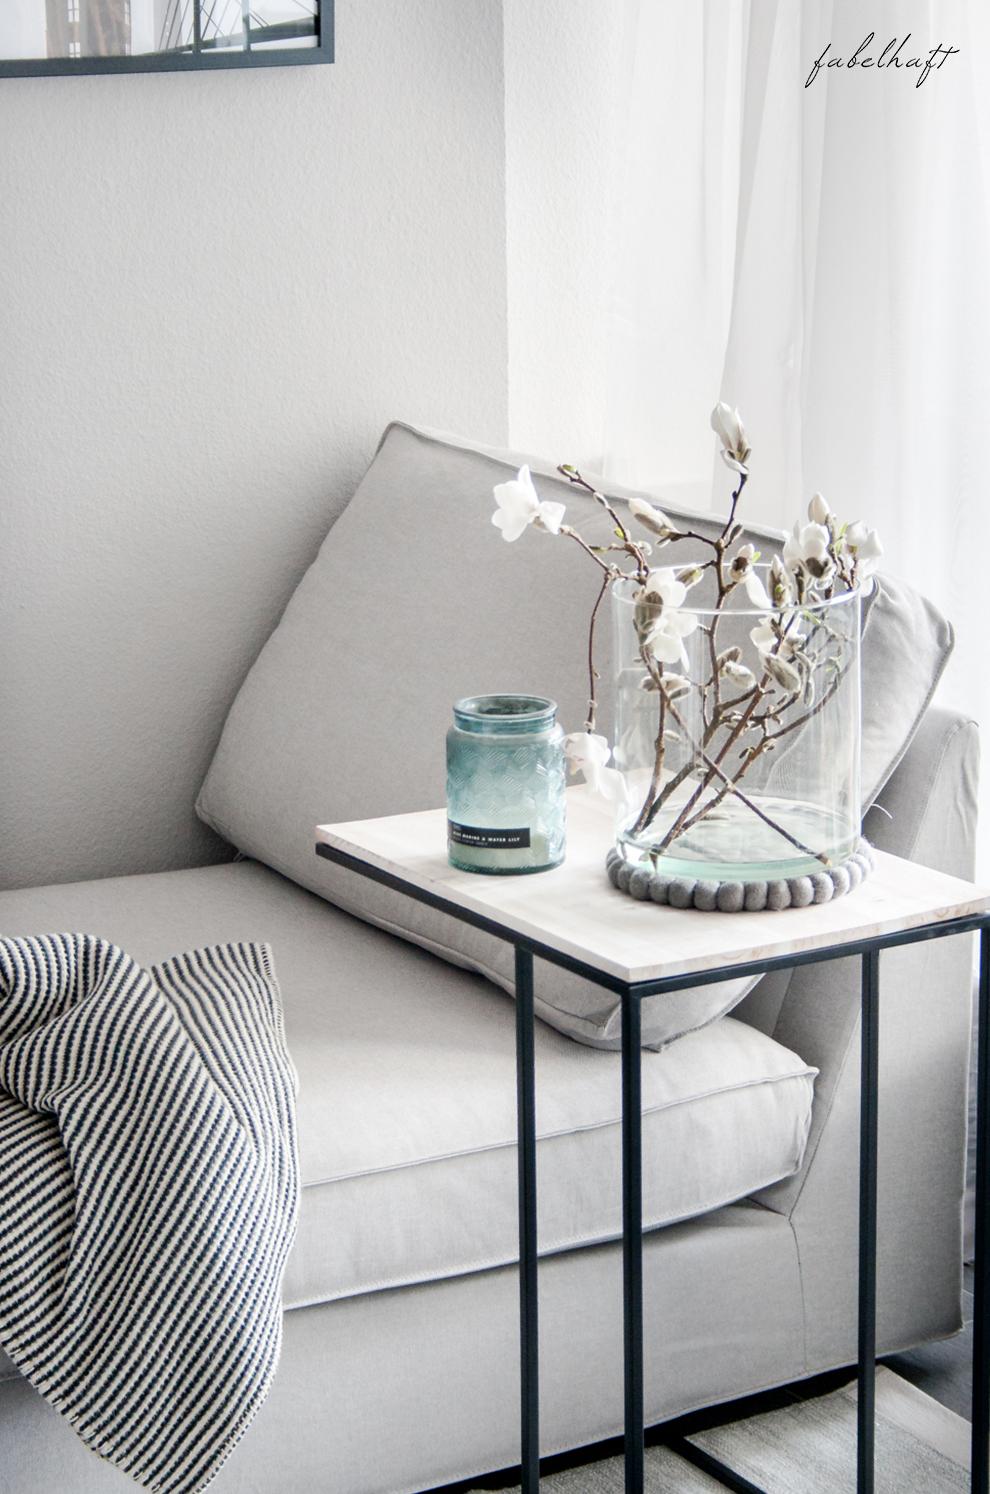 Recarmiere Fein und Fabelhaft Blog Lounge Interior Trend Europa Apotheek Möve Grau Frühling 8